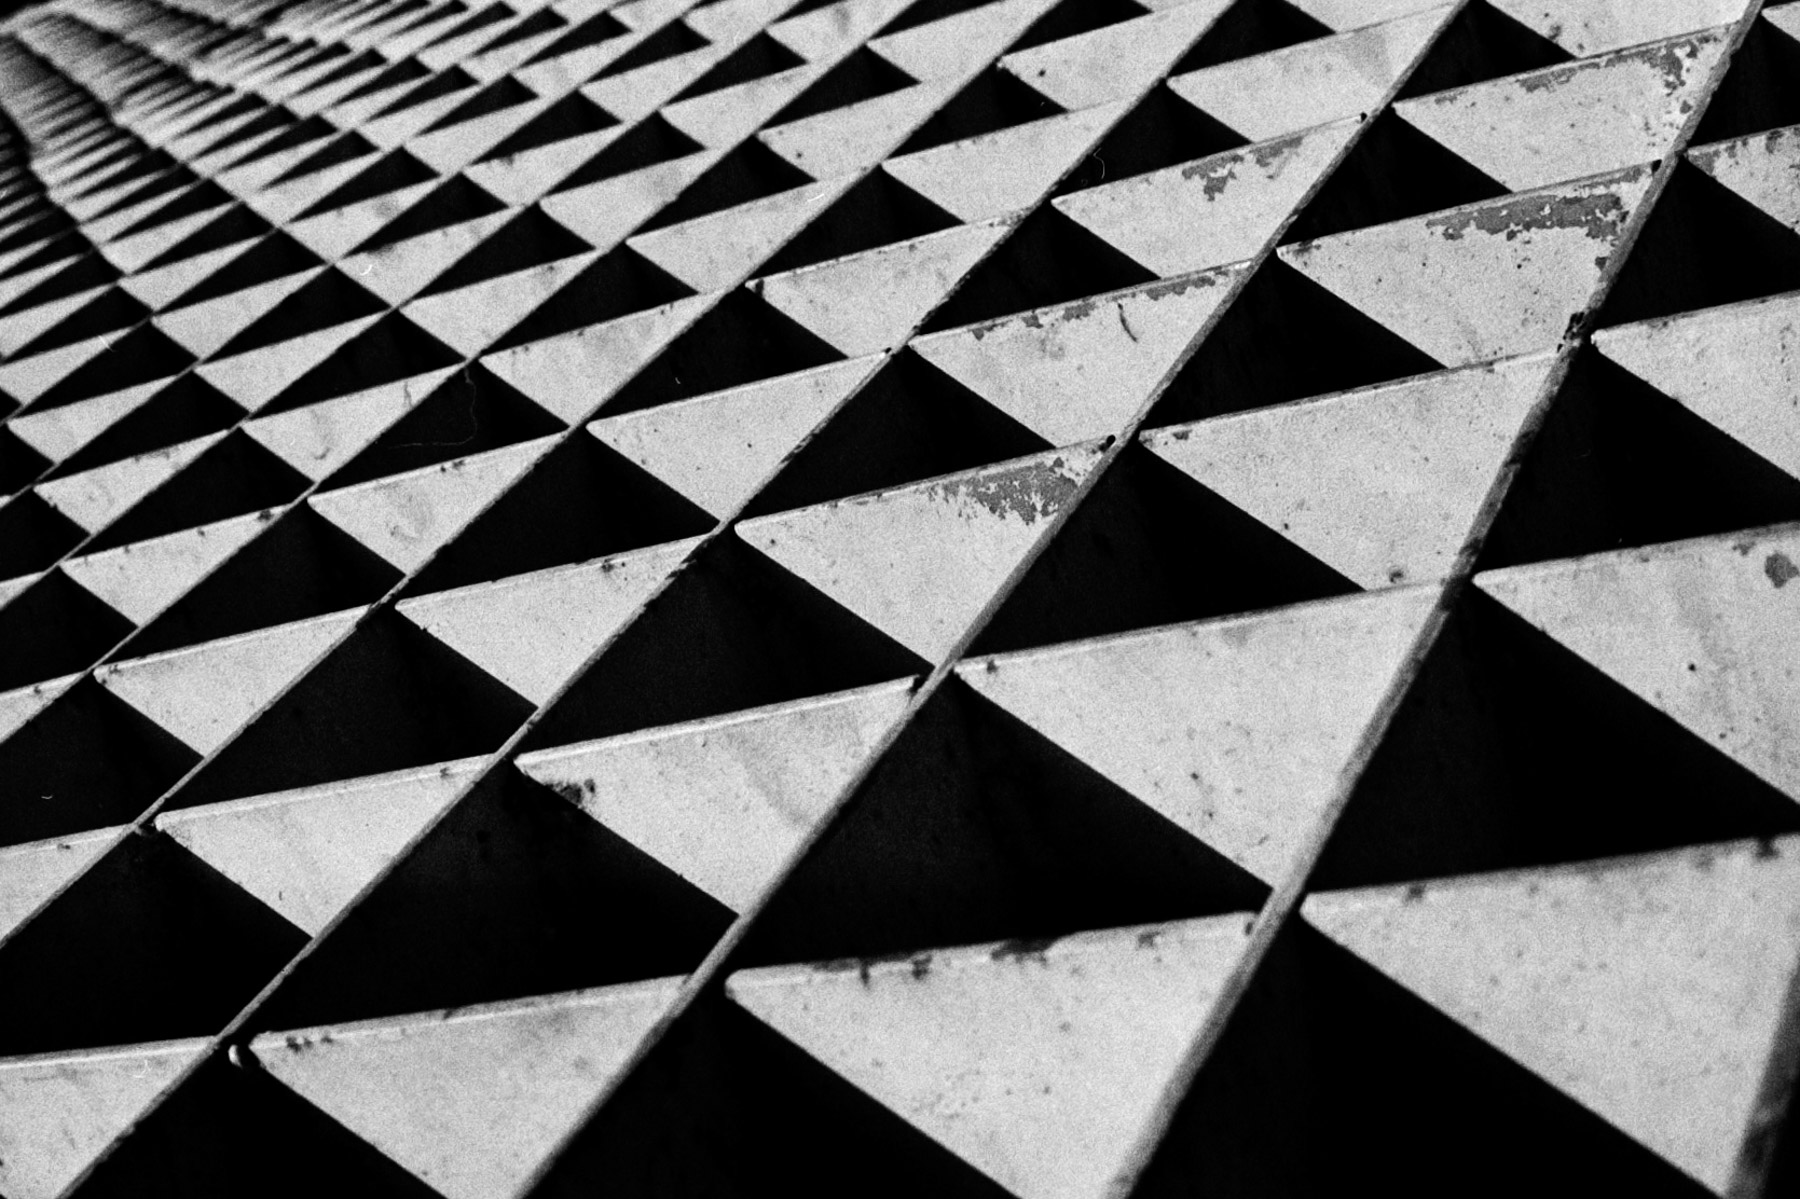 Efrain Bojorquez  About squares and triangles  Asahi Pentax Spotmatic  Kodak TriX 400